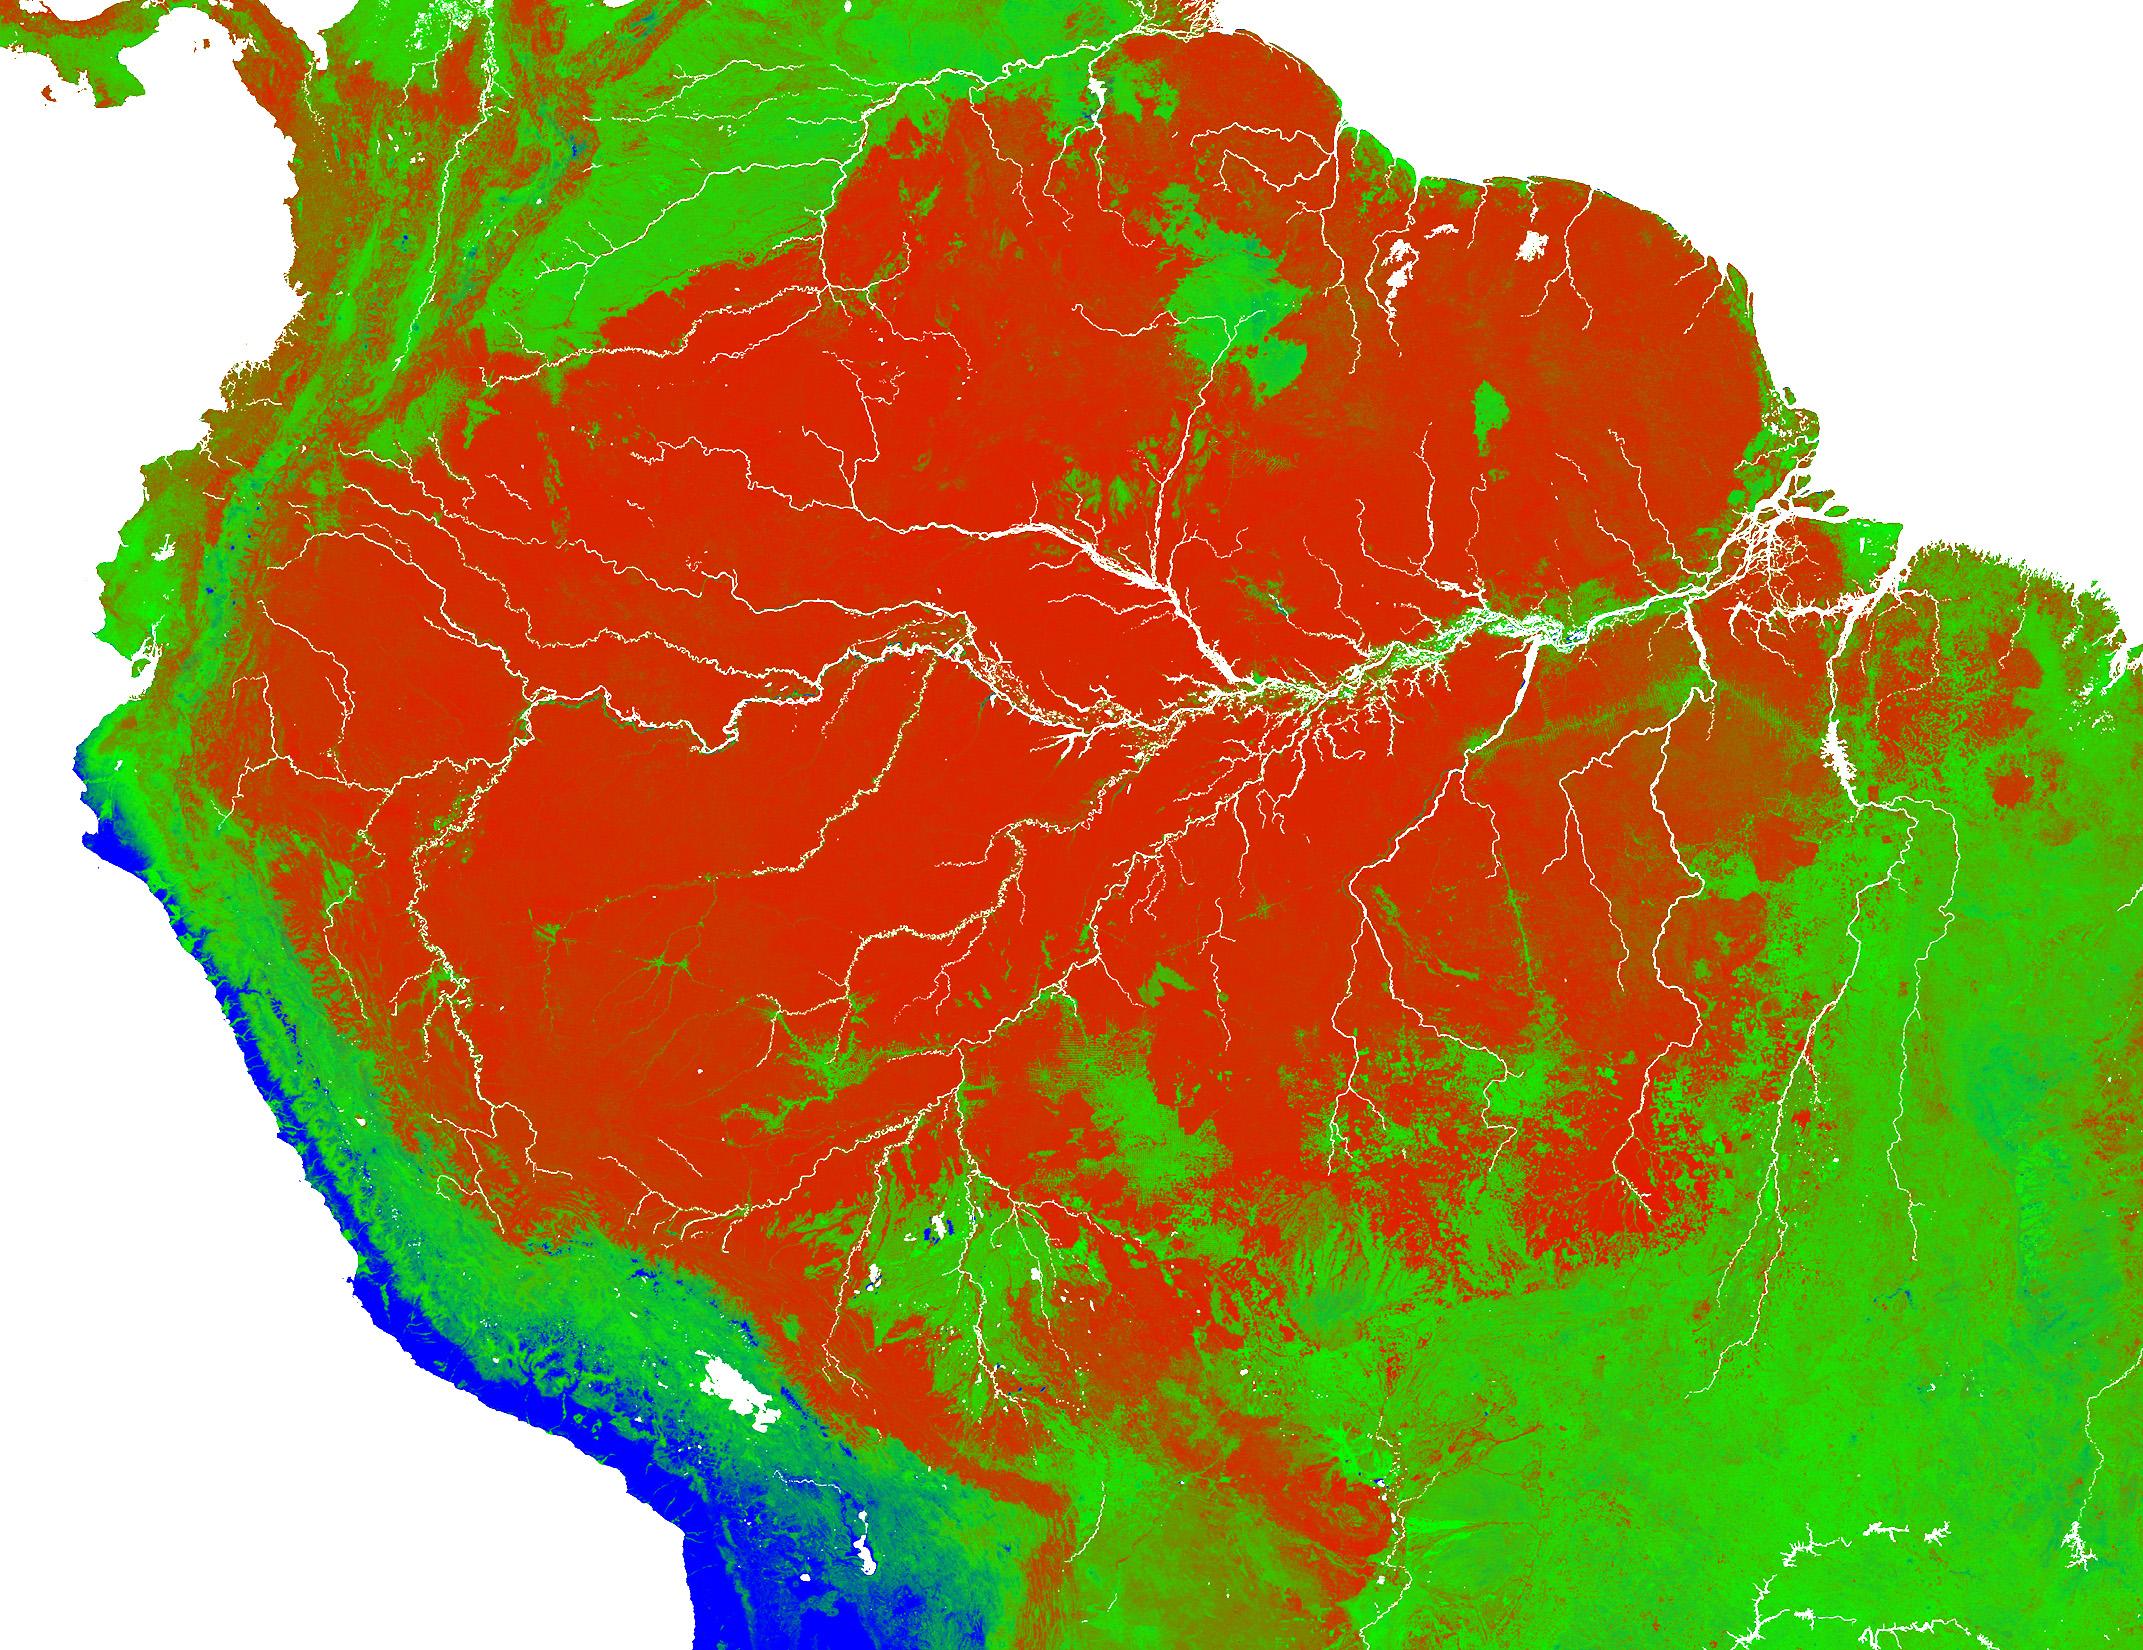 download large image  2 MB  JPEG  2143x1650 Amazon Rainforest Map Deforestation